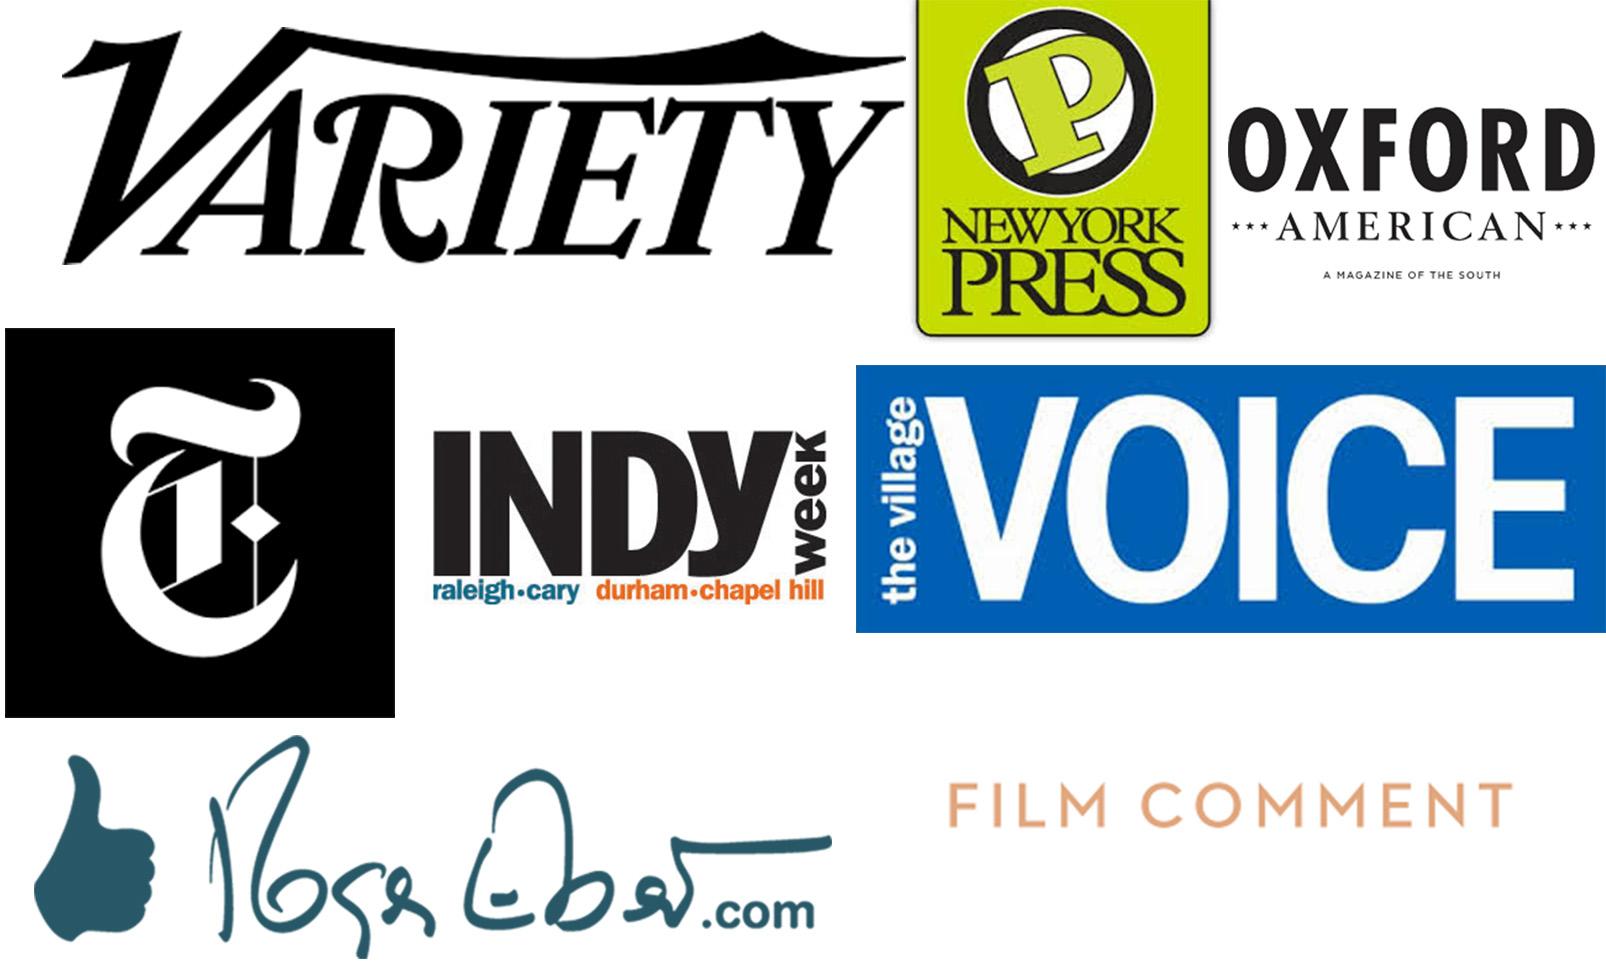 Film Criticism Godfrey Cheshire